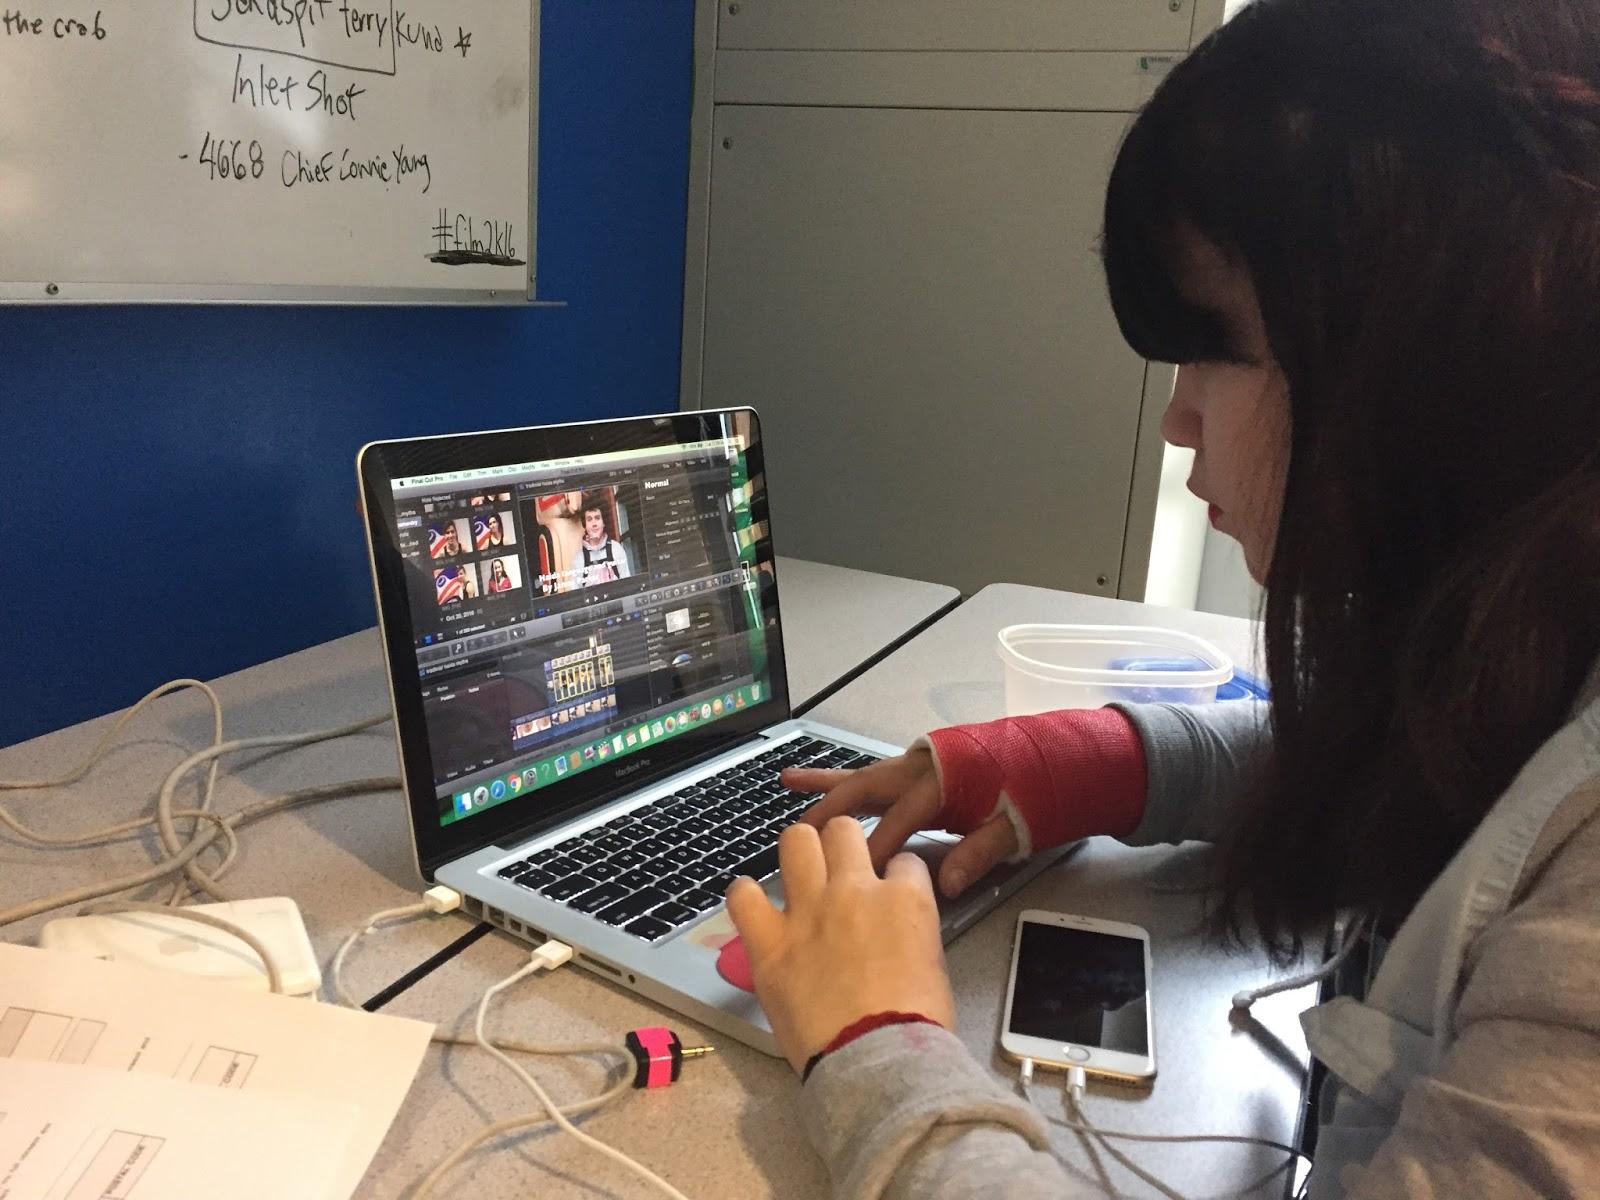 Tyra working on credits